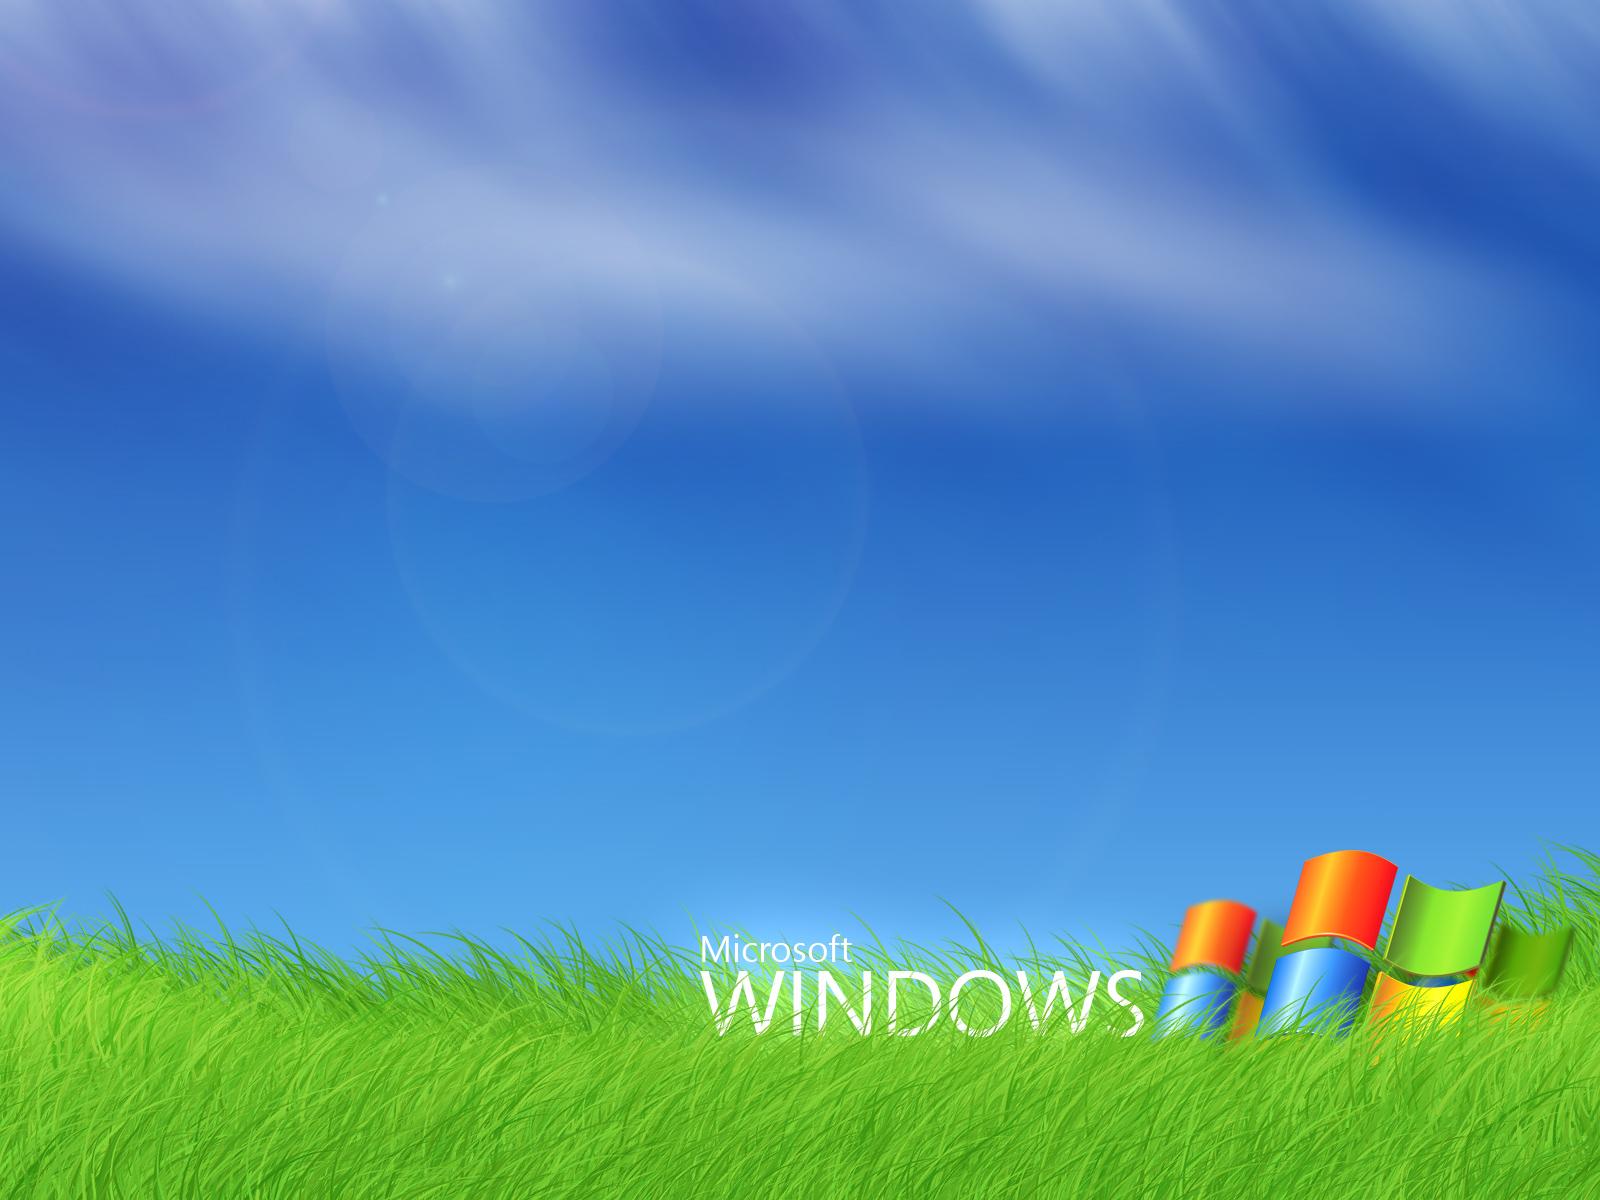 ... : Cool Wallpapers , Windows 7 , Windows Vista , Windows Wallpapers